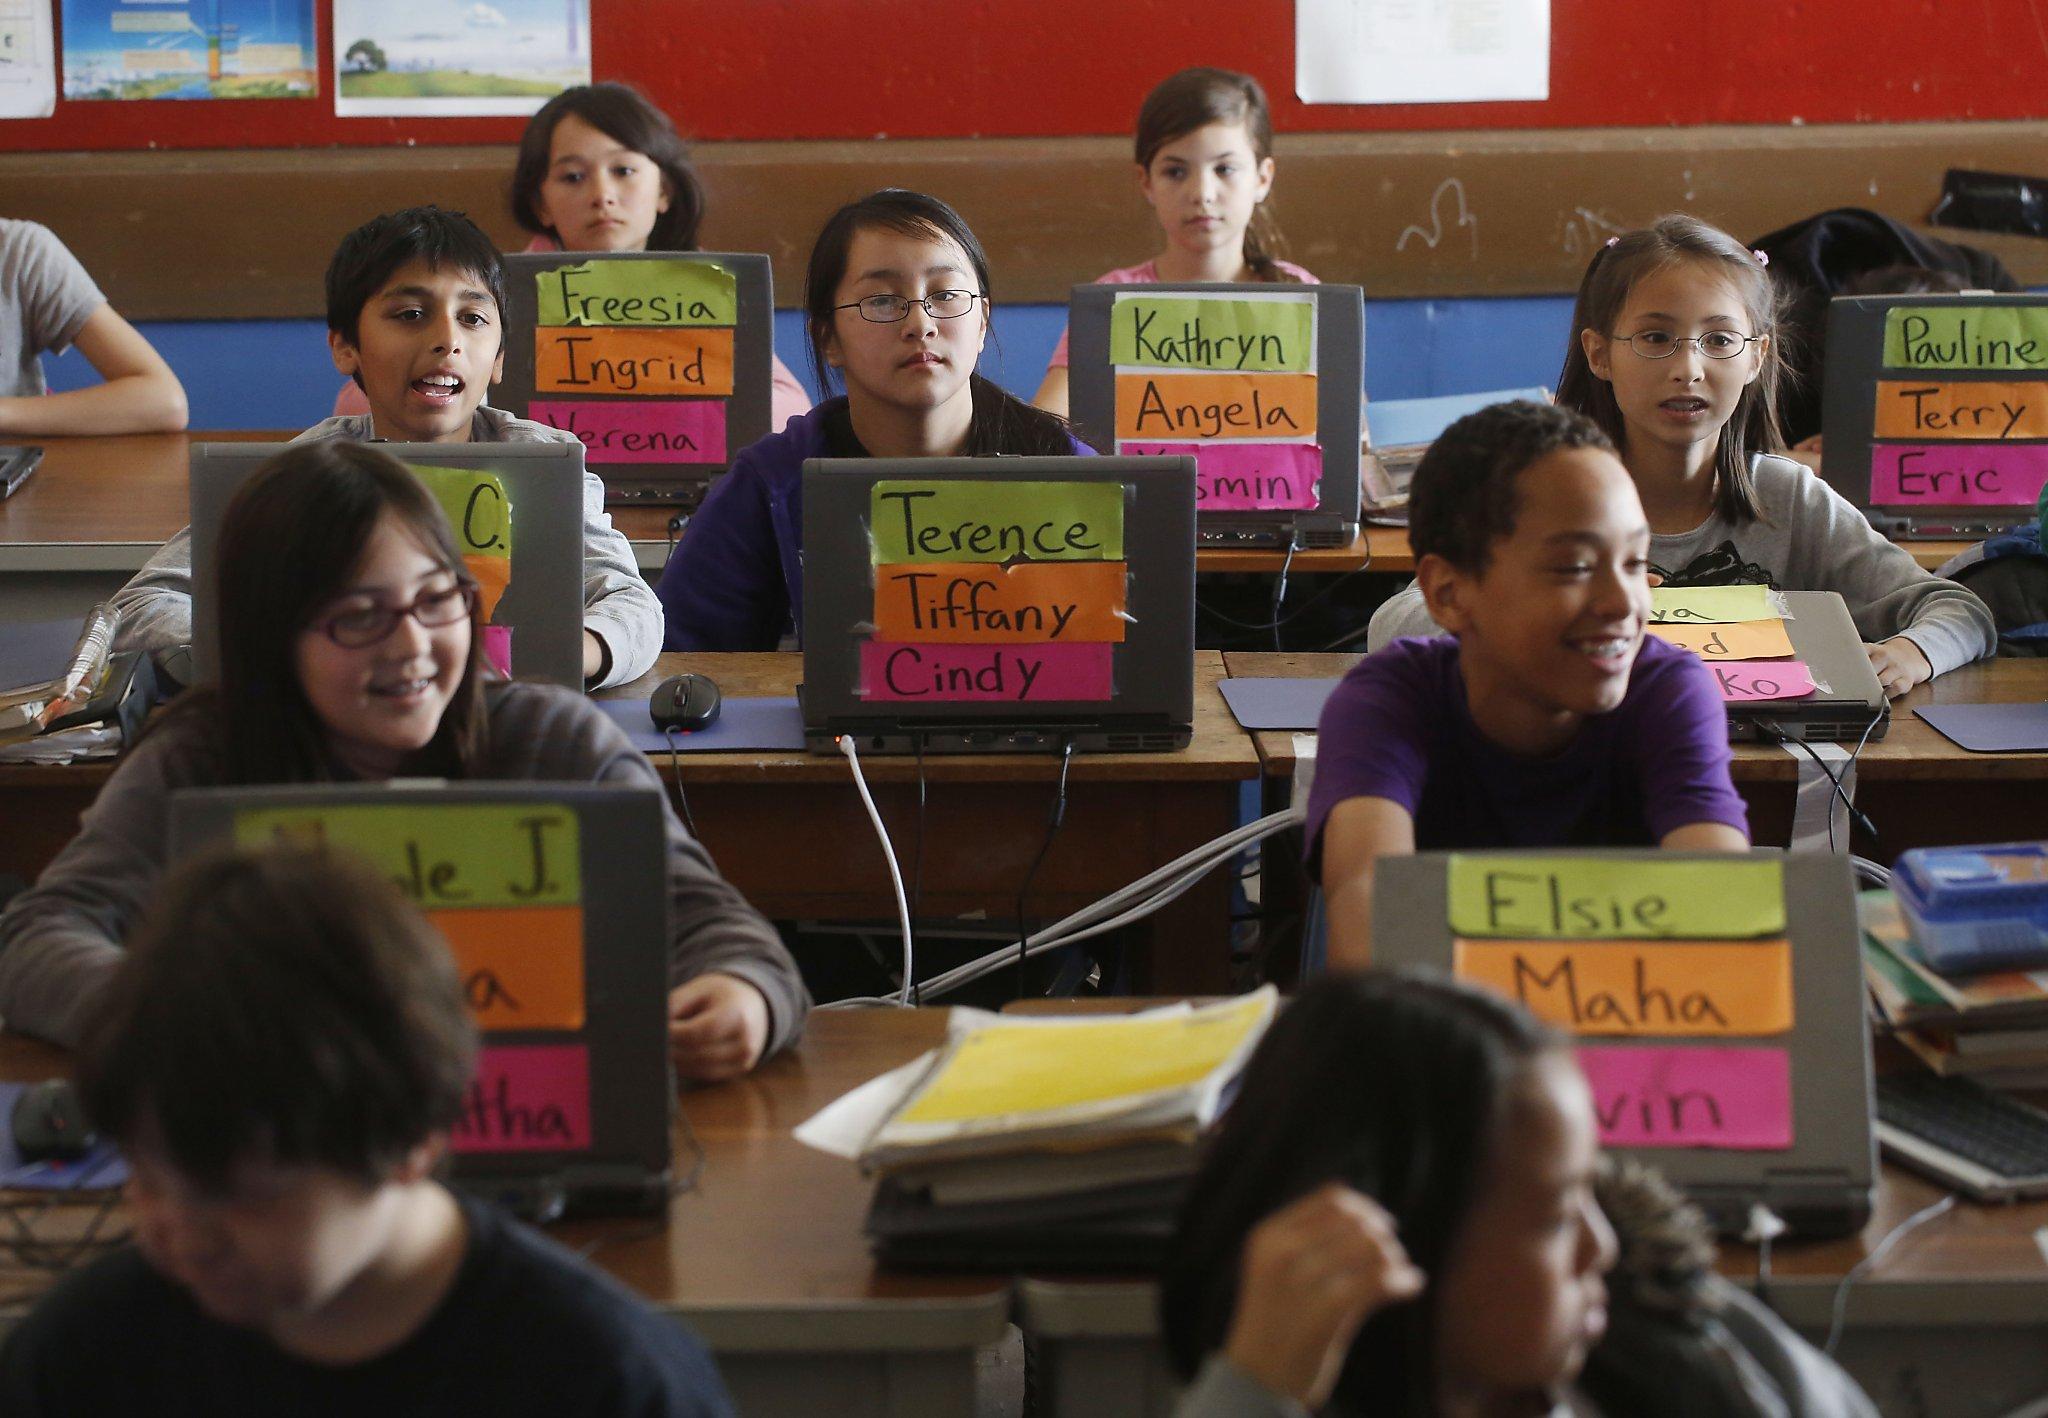 S F Schools Special Education Shift Creates Upheaval